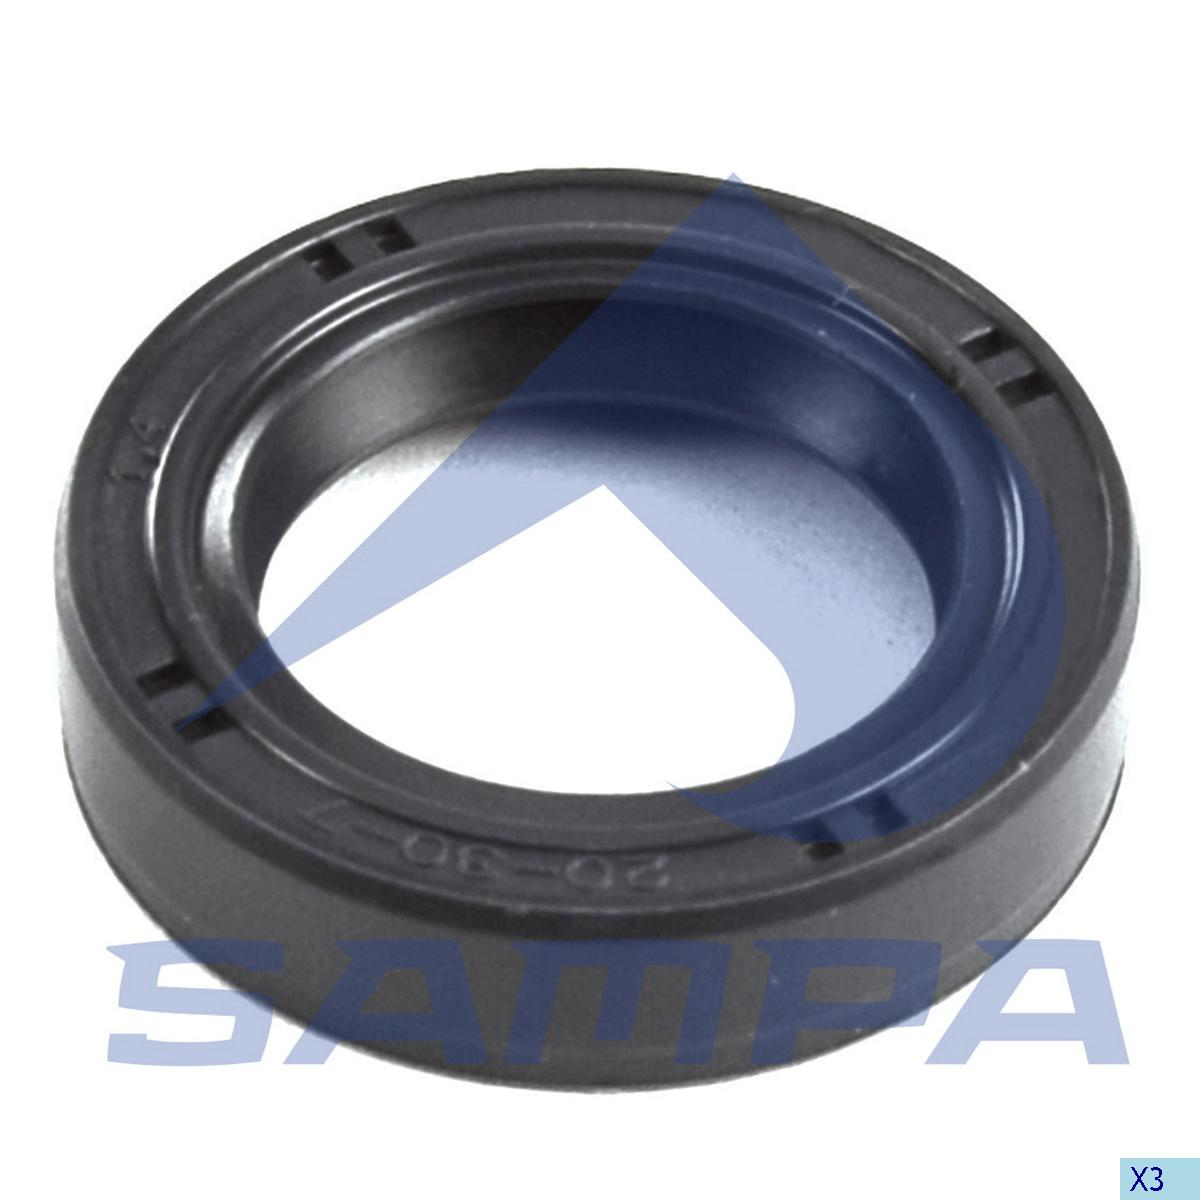 Seal Ring, Gear Selector Housing, R.V.I., Gear Box